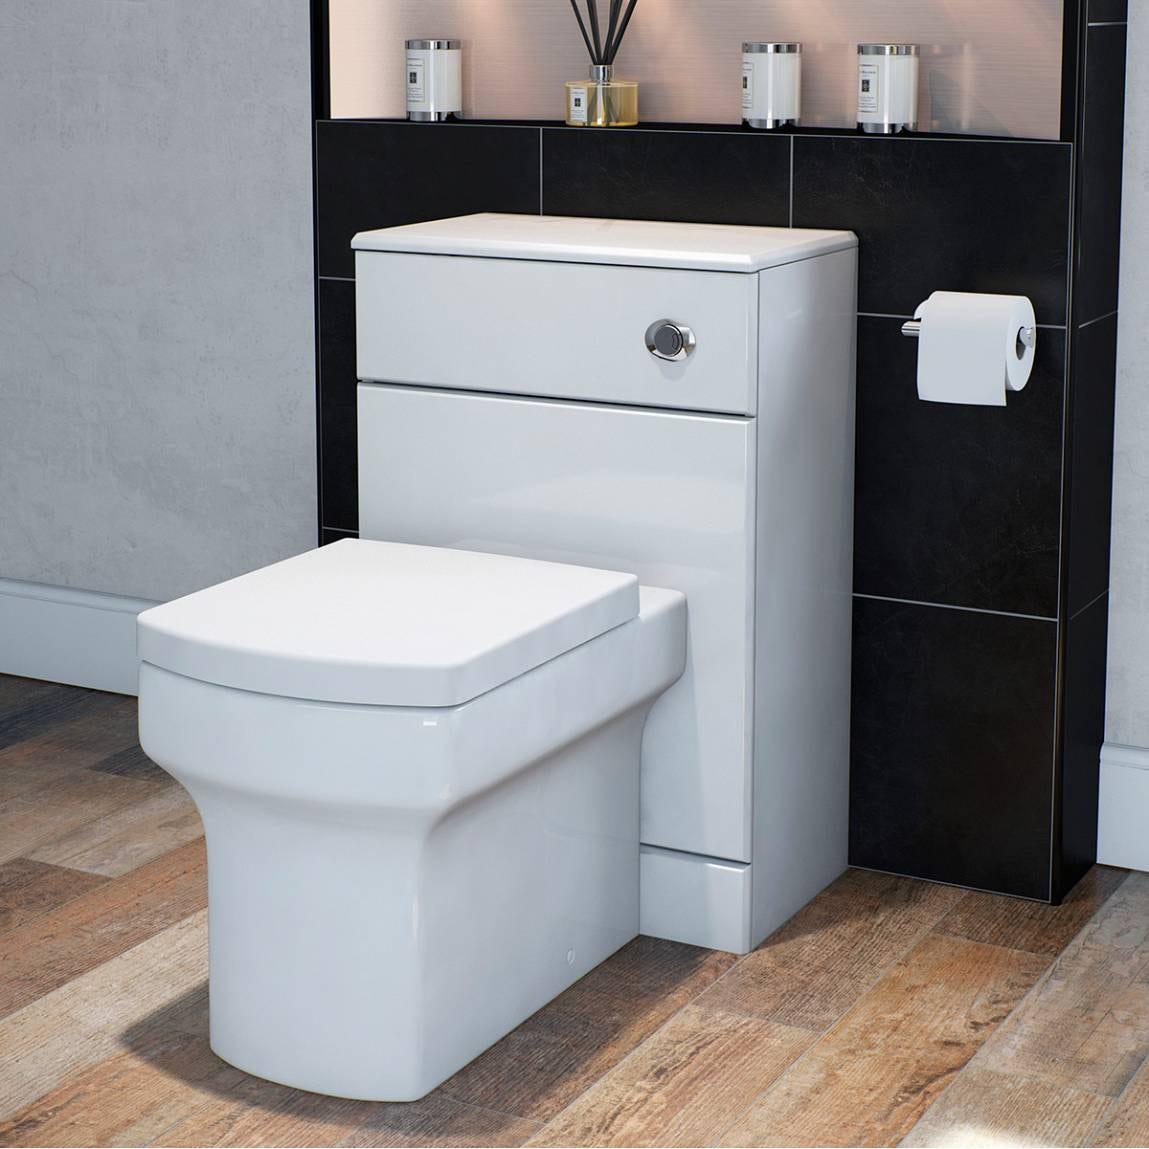 Wye Back to Wall Toilet inc Luxury Soft Close Seat